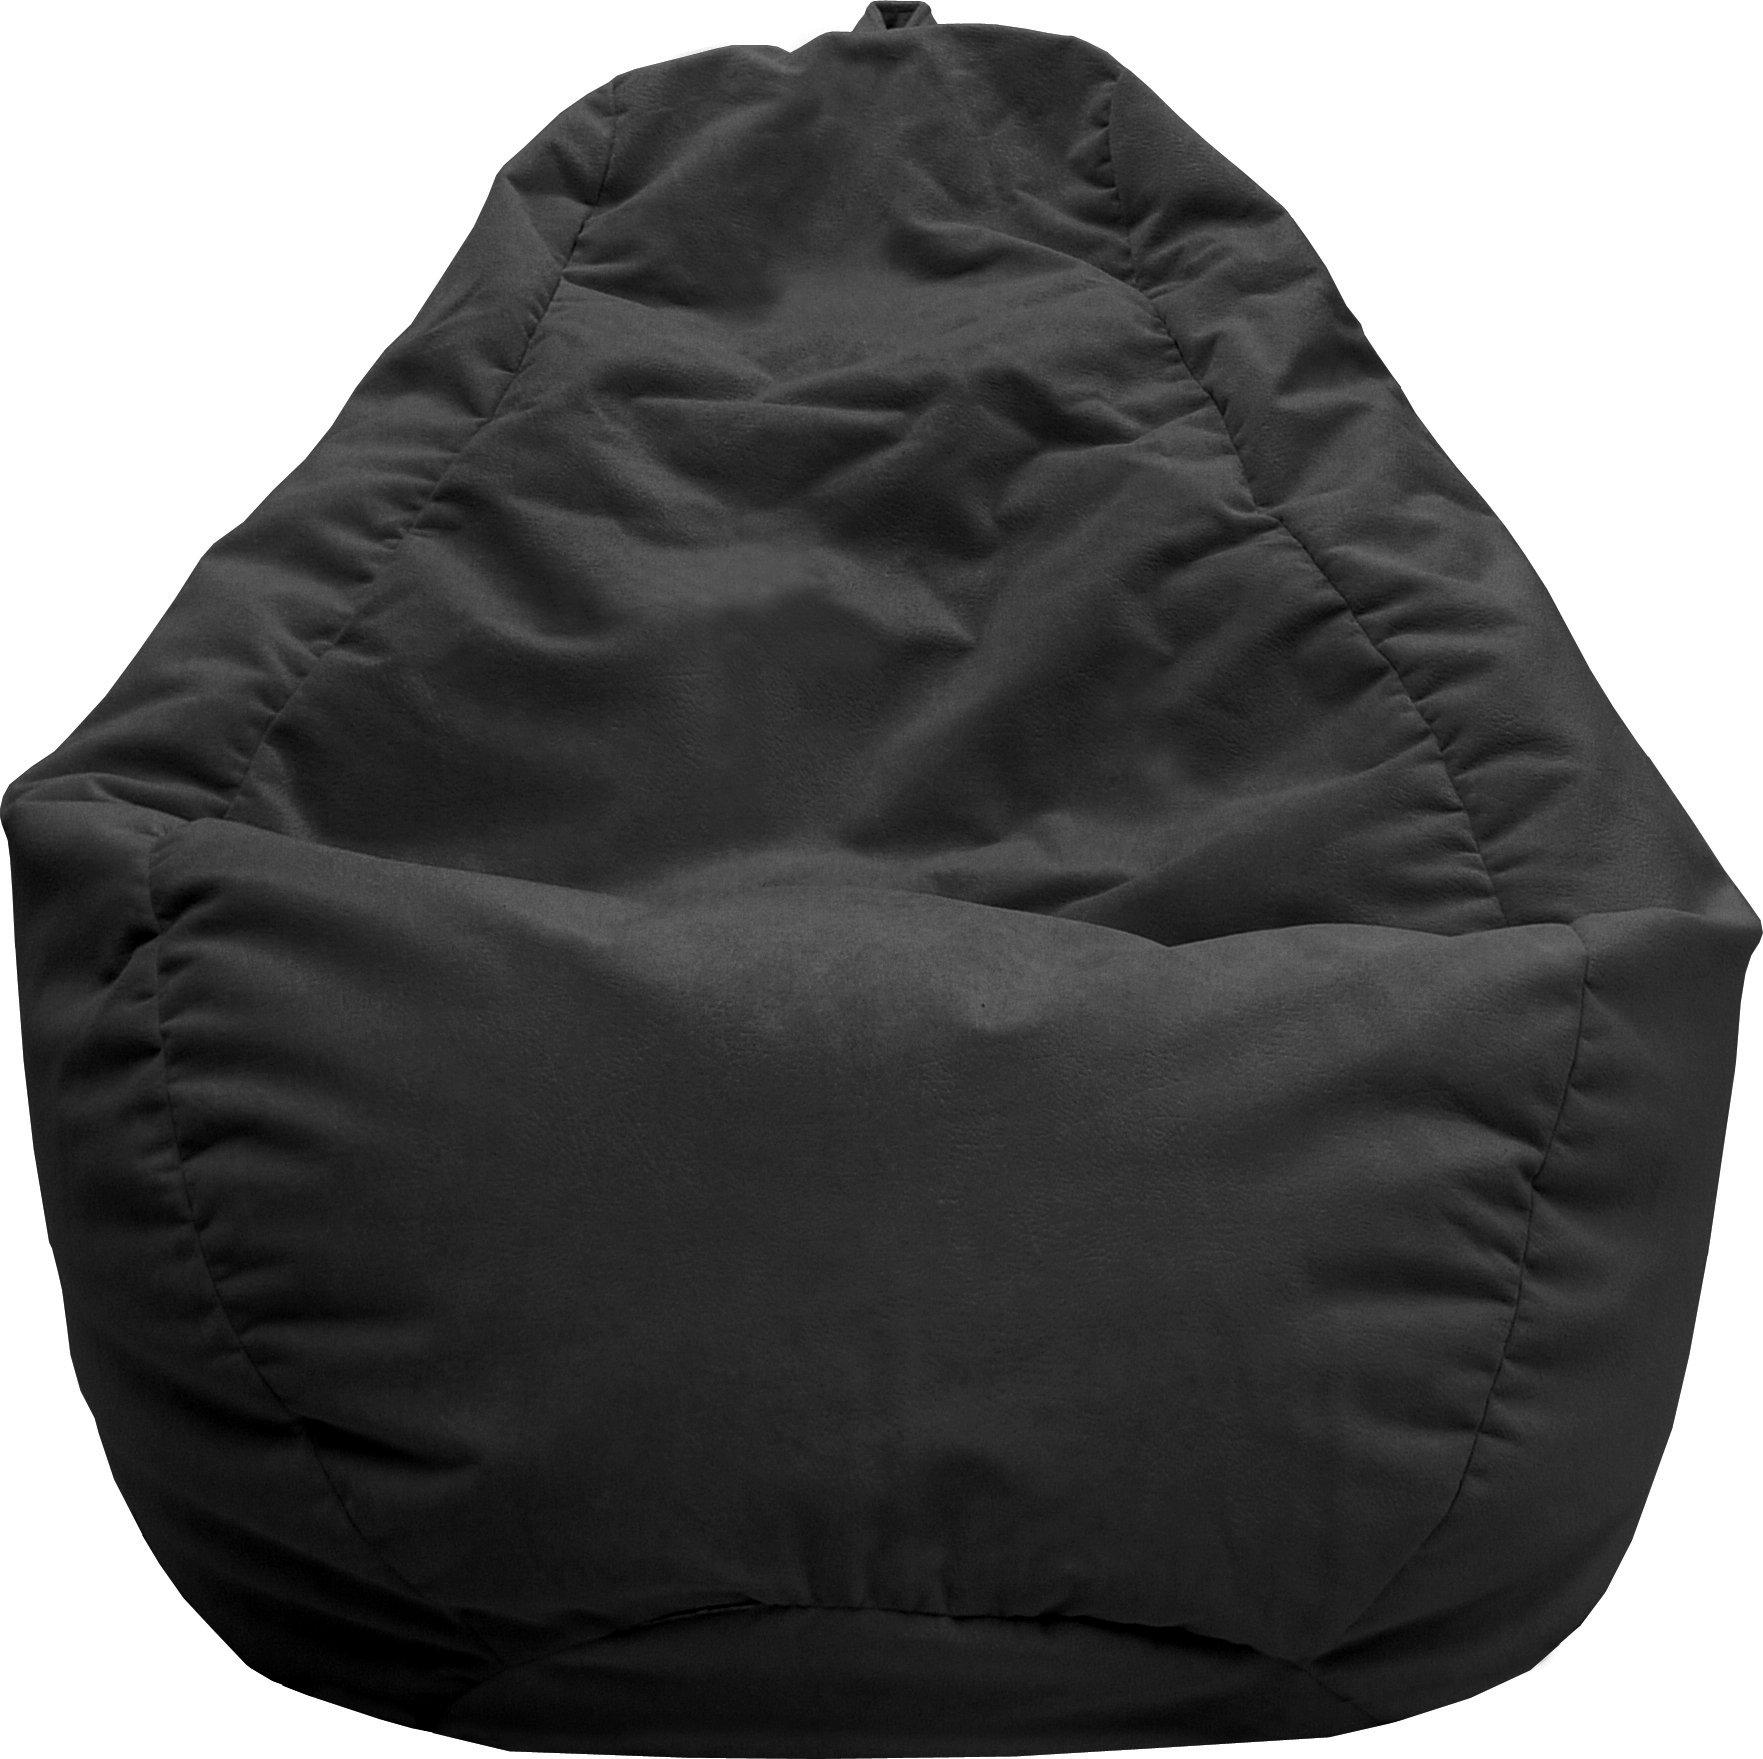 Gold Medal Bean Bags Tear Drop Fairview Micro-Fiber Suede Bean Bag, Large, Black